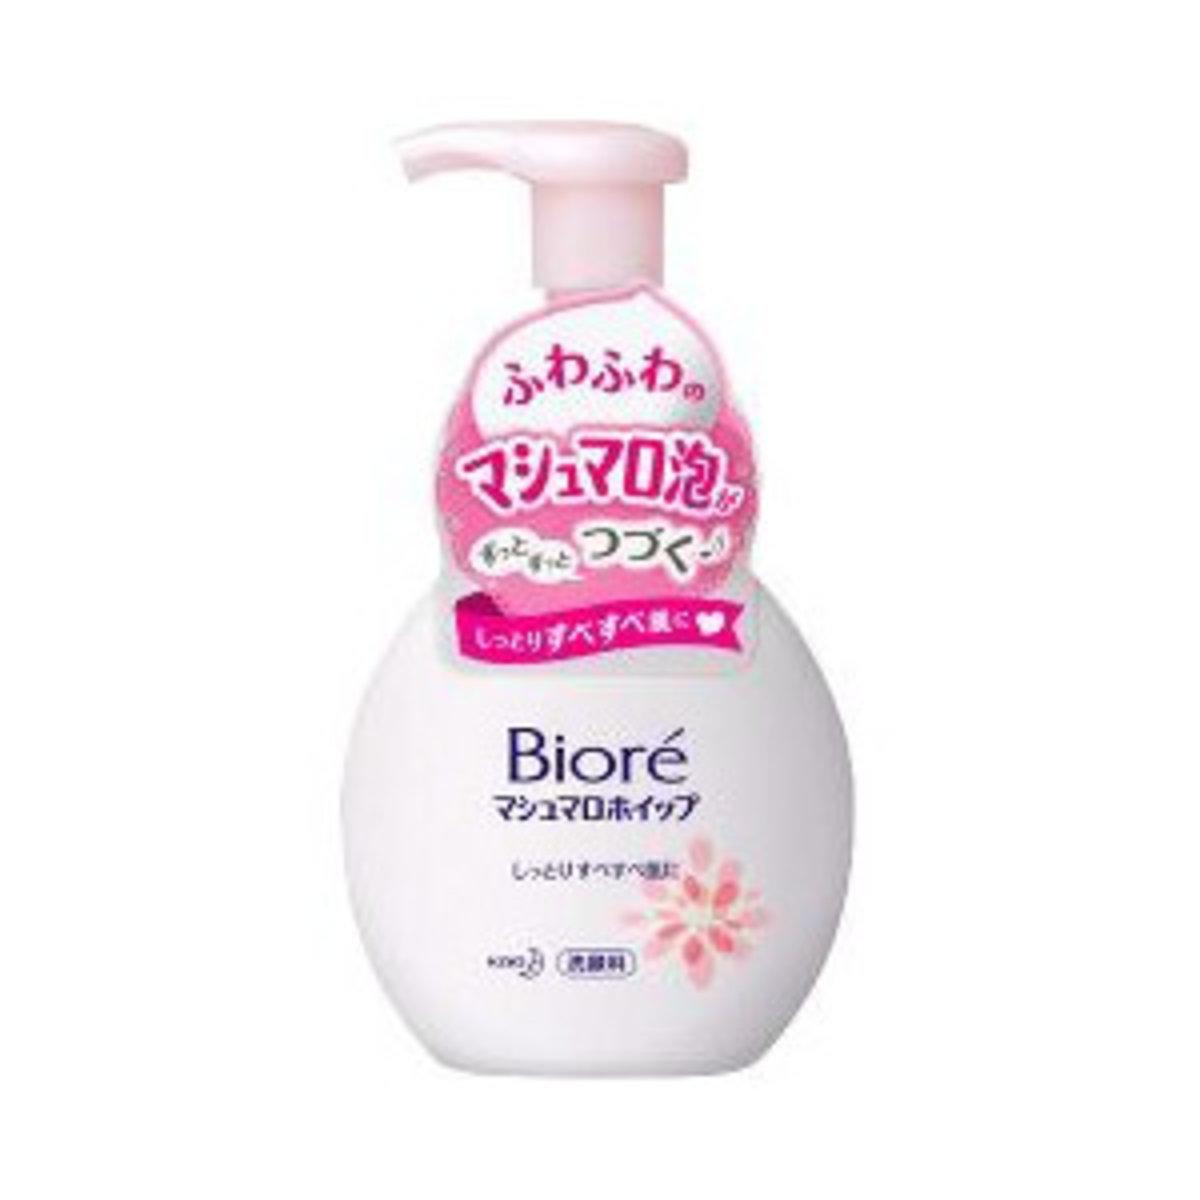 Biore bubble face moist wash(Pink) 150ml